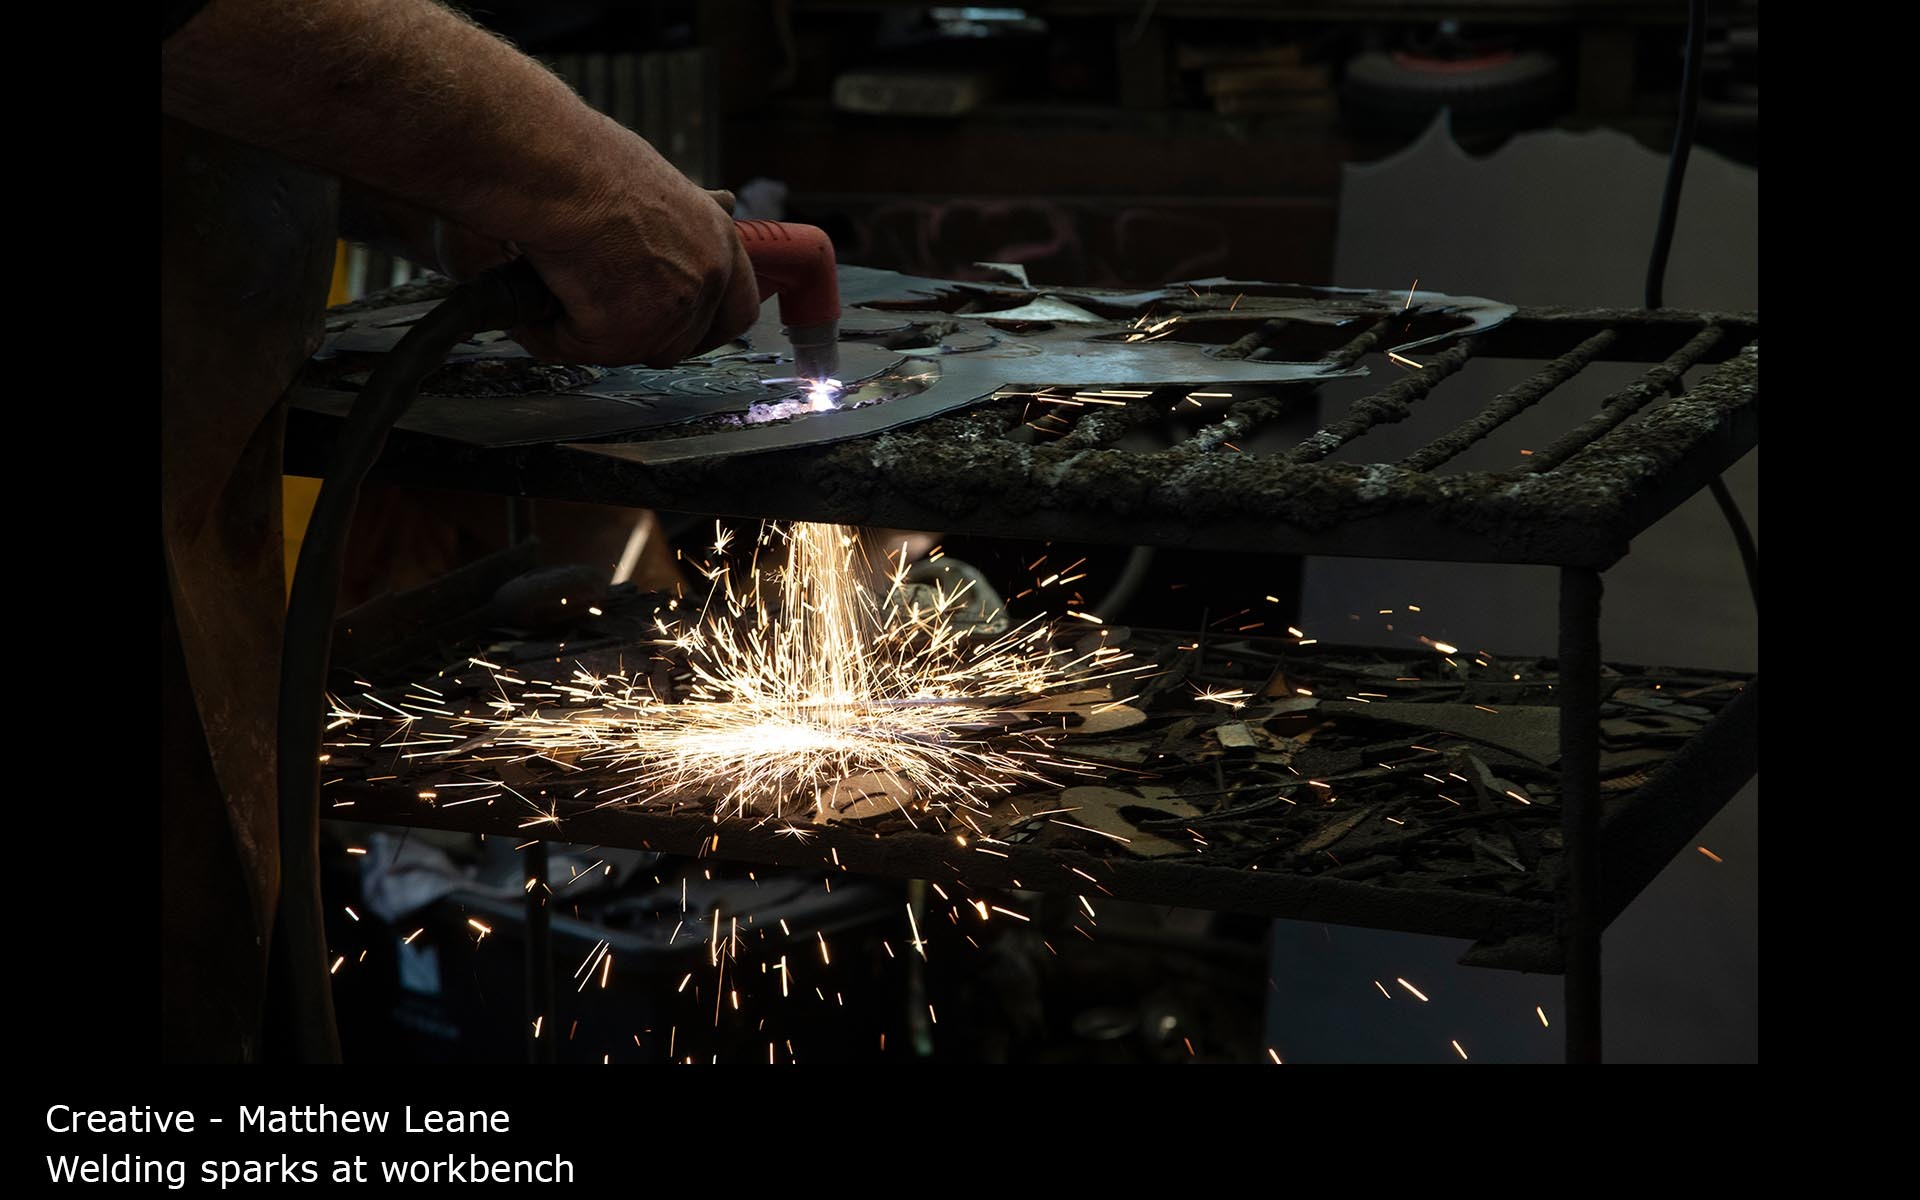 Welding sparks at workbench - Matthew Leane